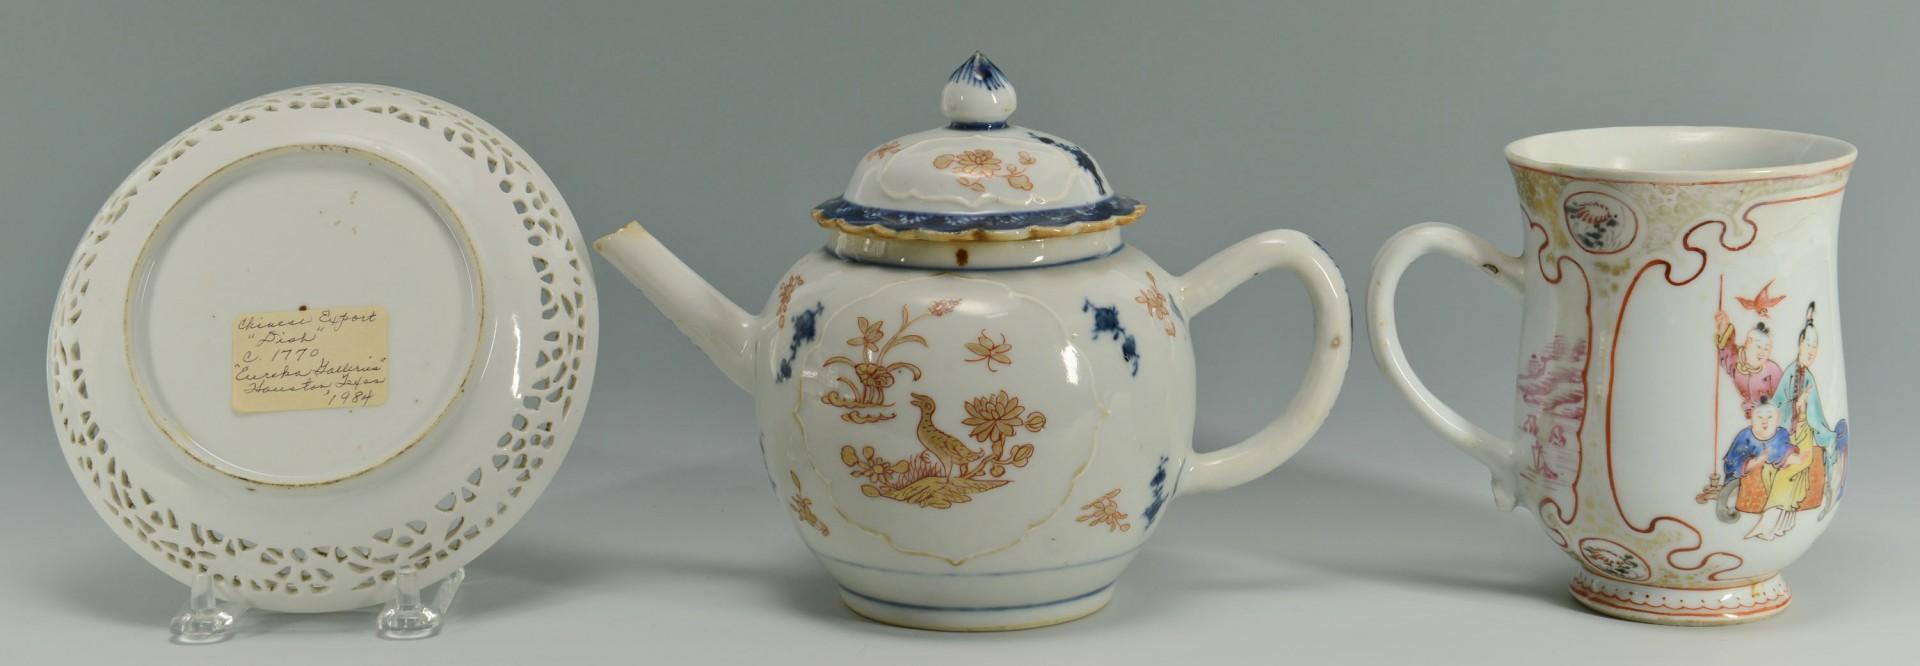 Lot 221: 3 18th c. Chinese Export Items: teapot, mug & dish